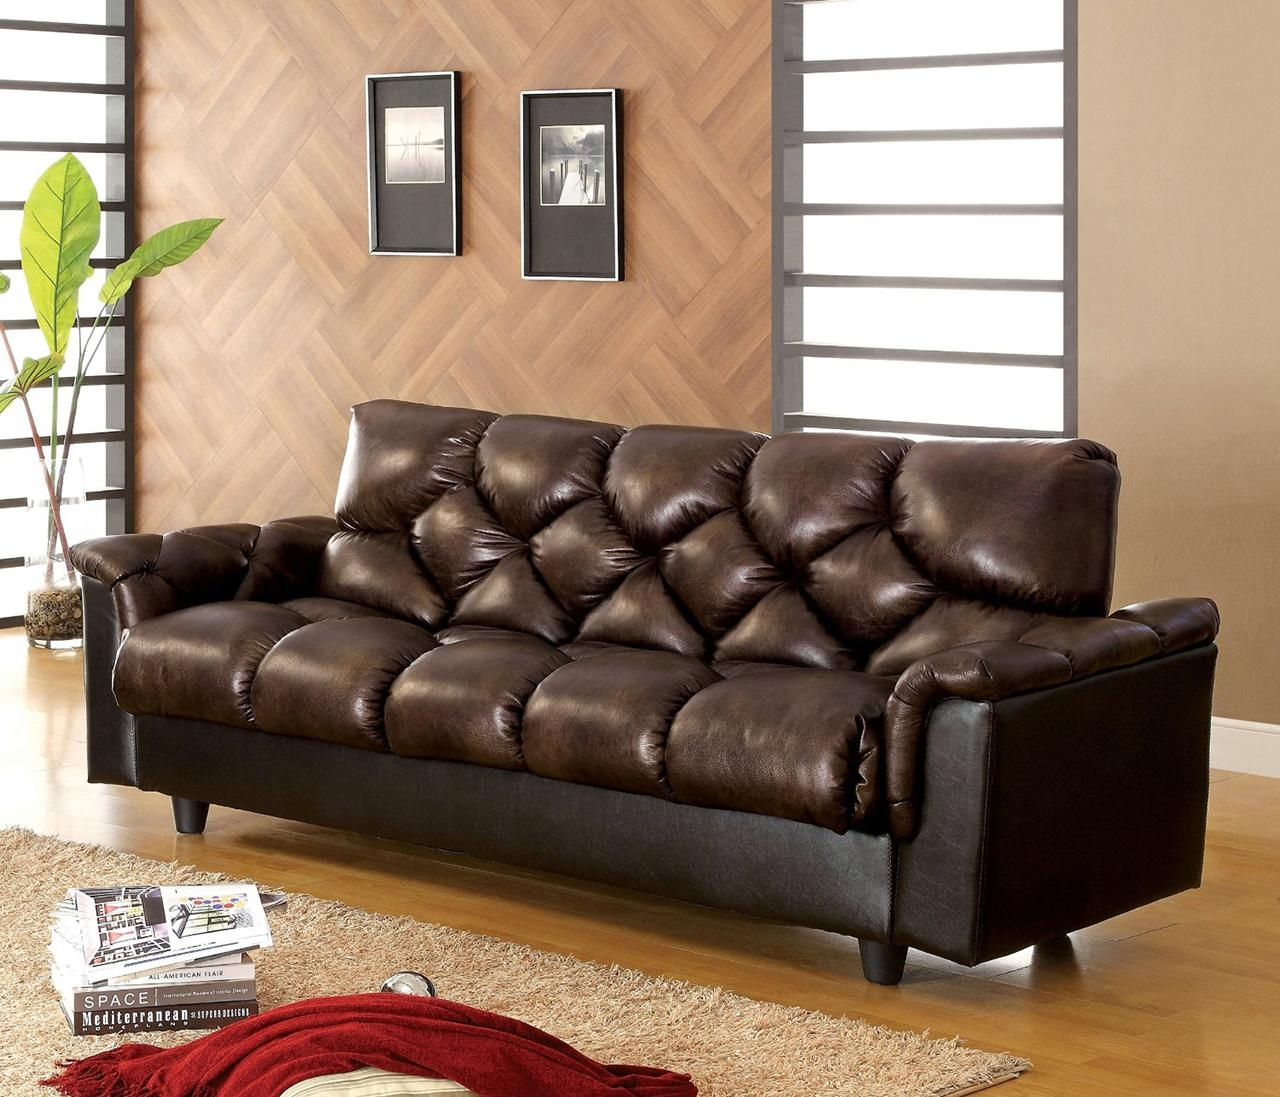 25 Best Sleeper Sofa Beds To Buy In 2017 Regarding Everyday Sleeper Sofas (View 5 of 20)